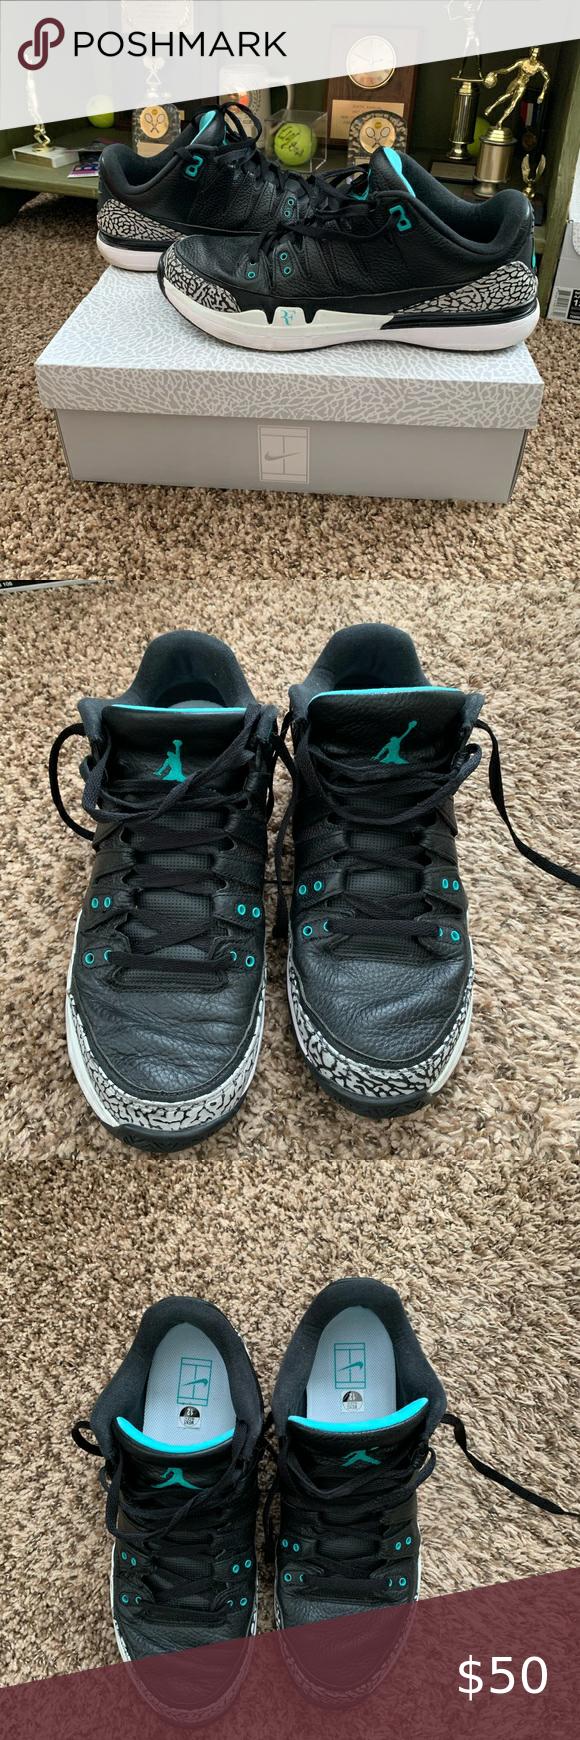 EUC Roger Federer Air Jordan Men's Tennis Shoes 12   Air jordans ...